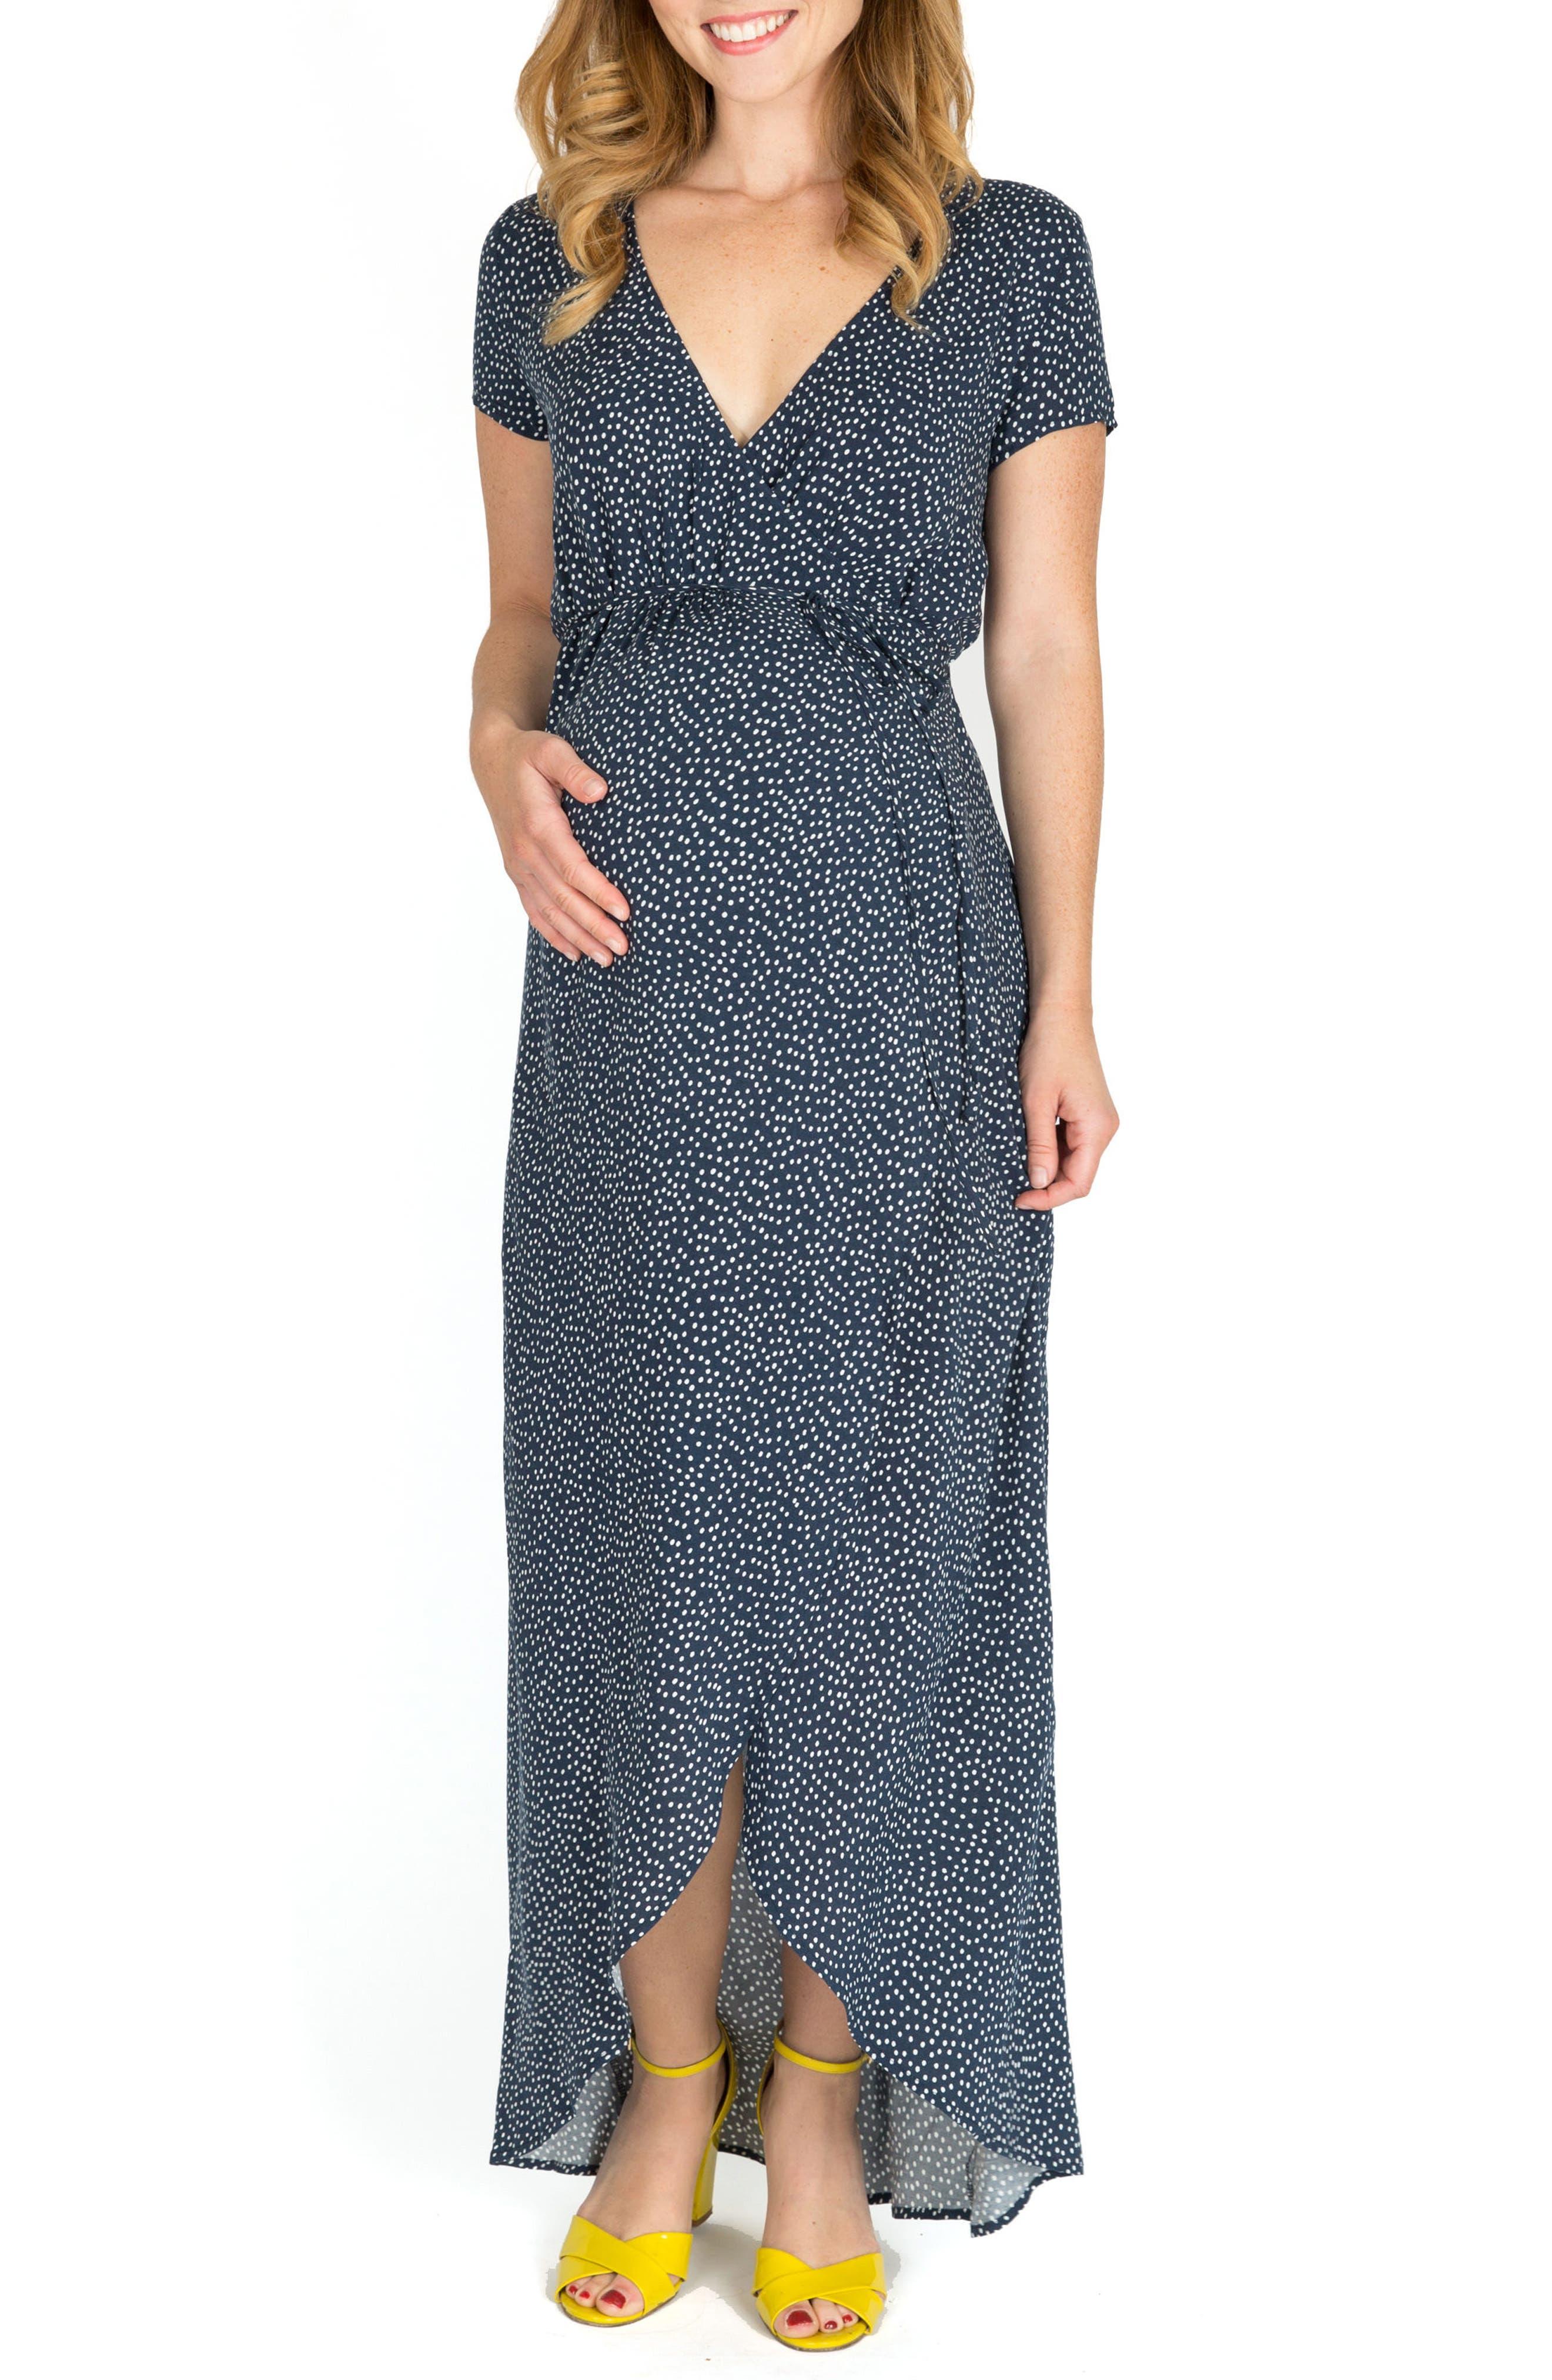 Maxi Dresses for Maternity